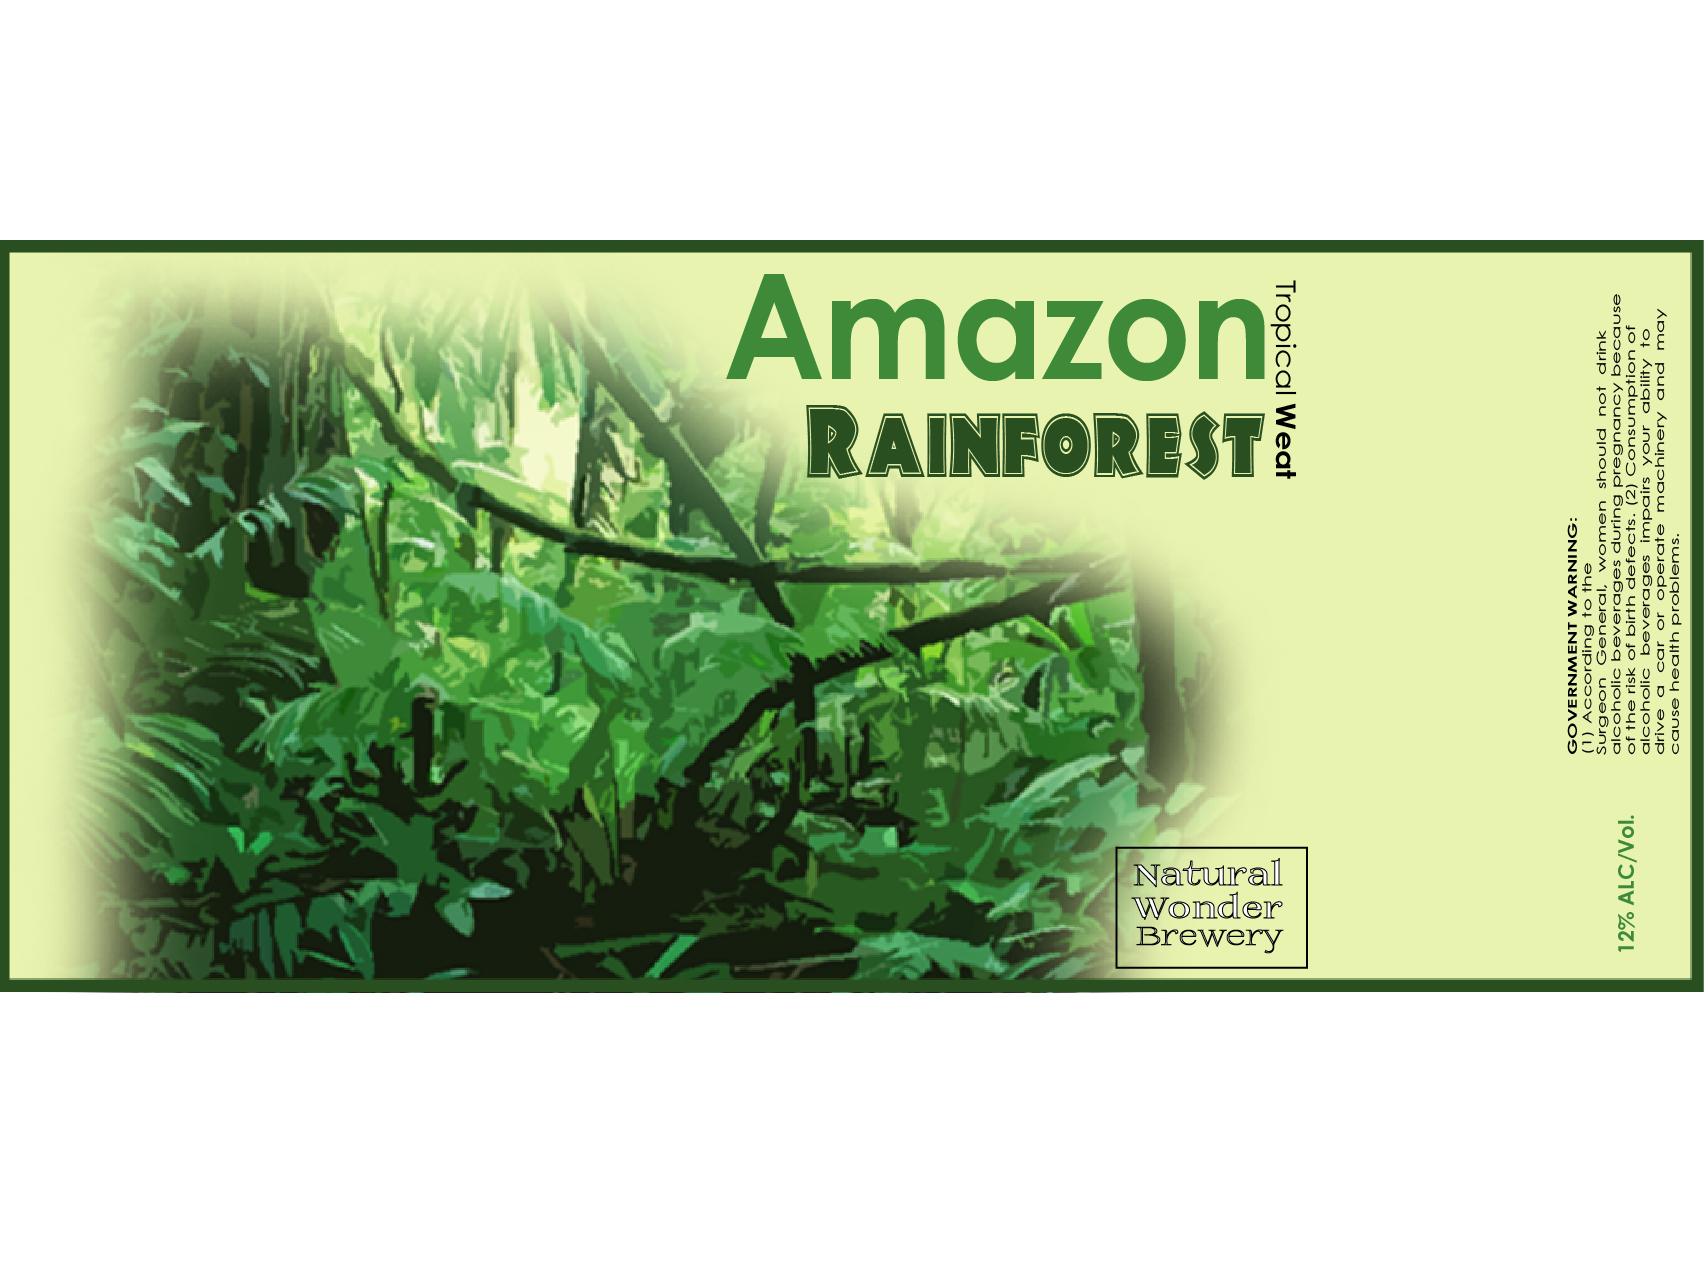 AmazonRainforest_Edited-01.jpg